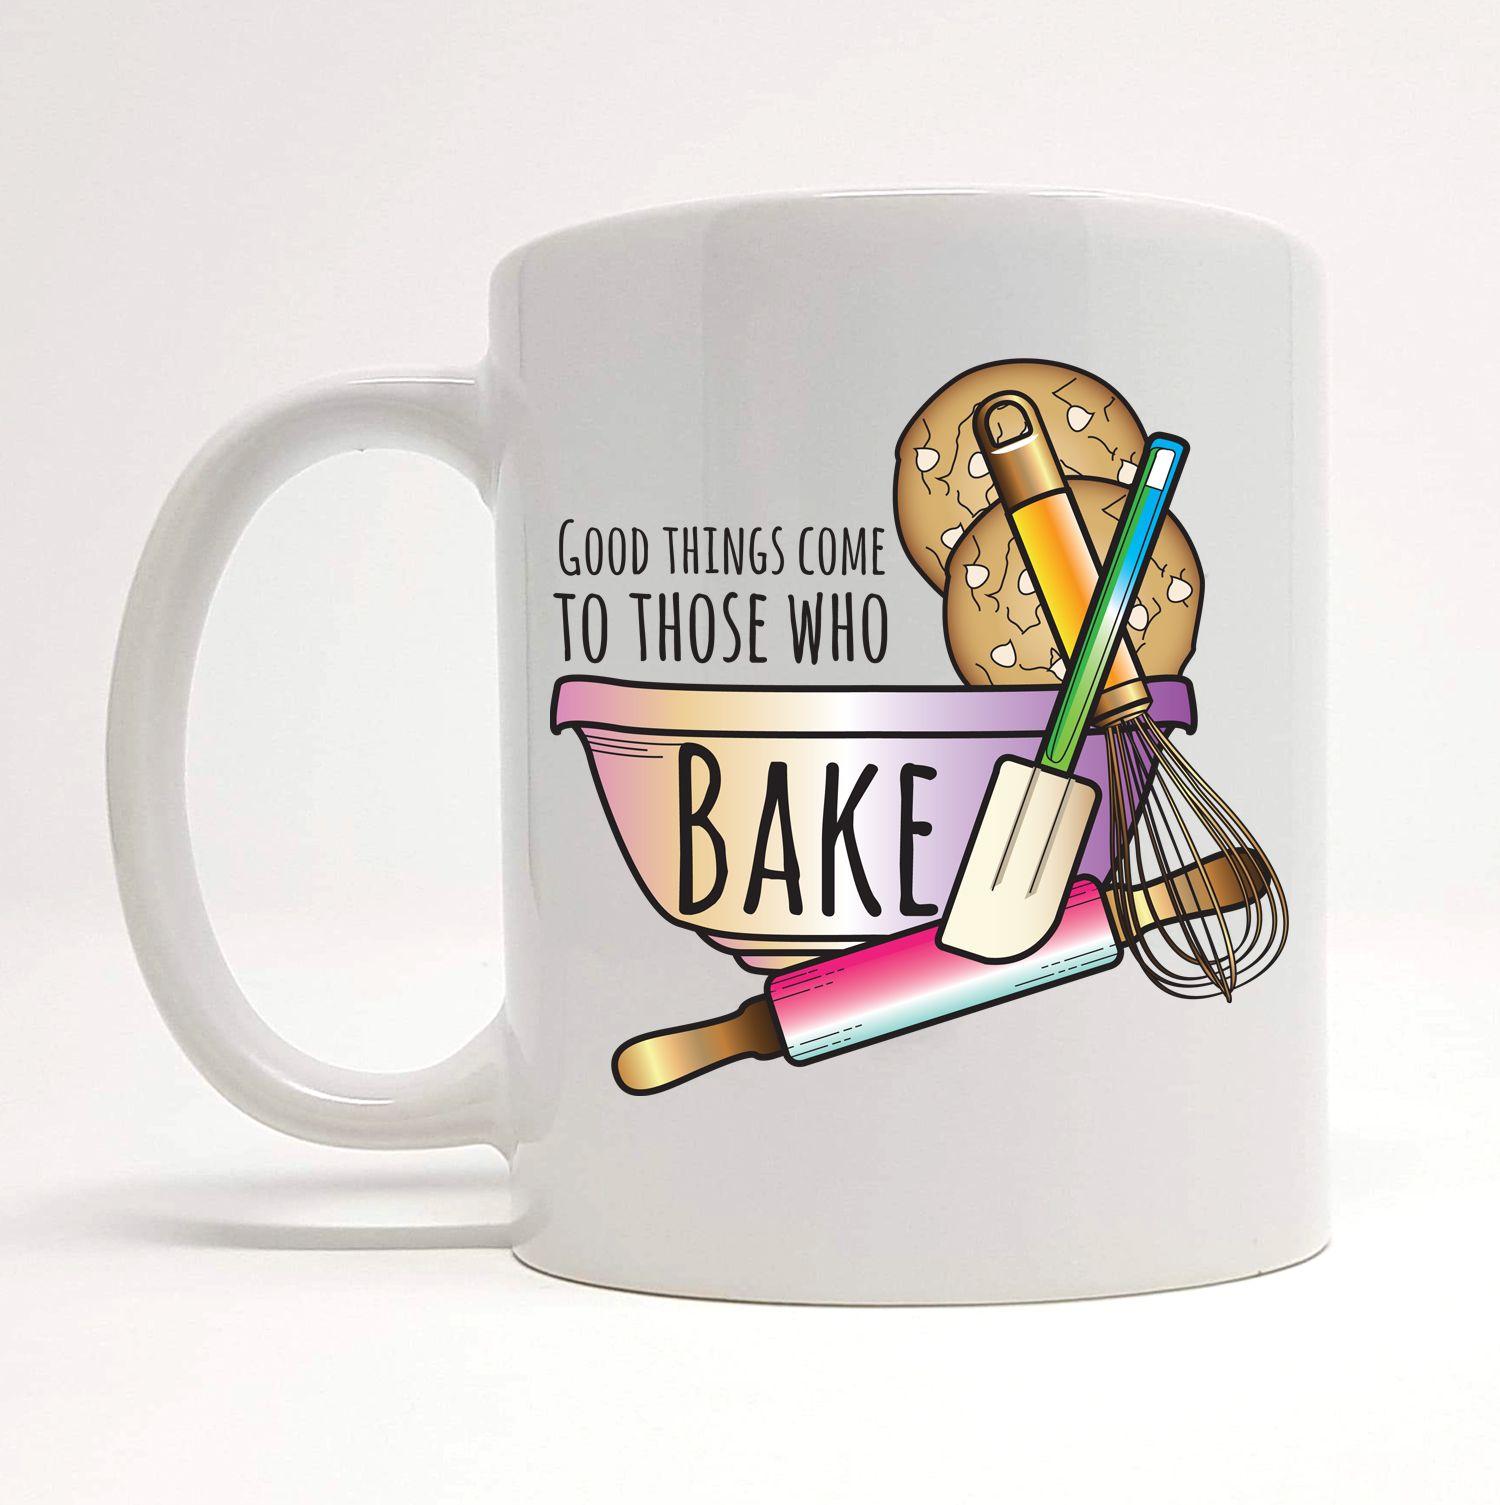 Baking Lover Mug Novelty Mug Funny Mugs Good Things